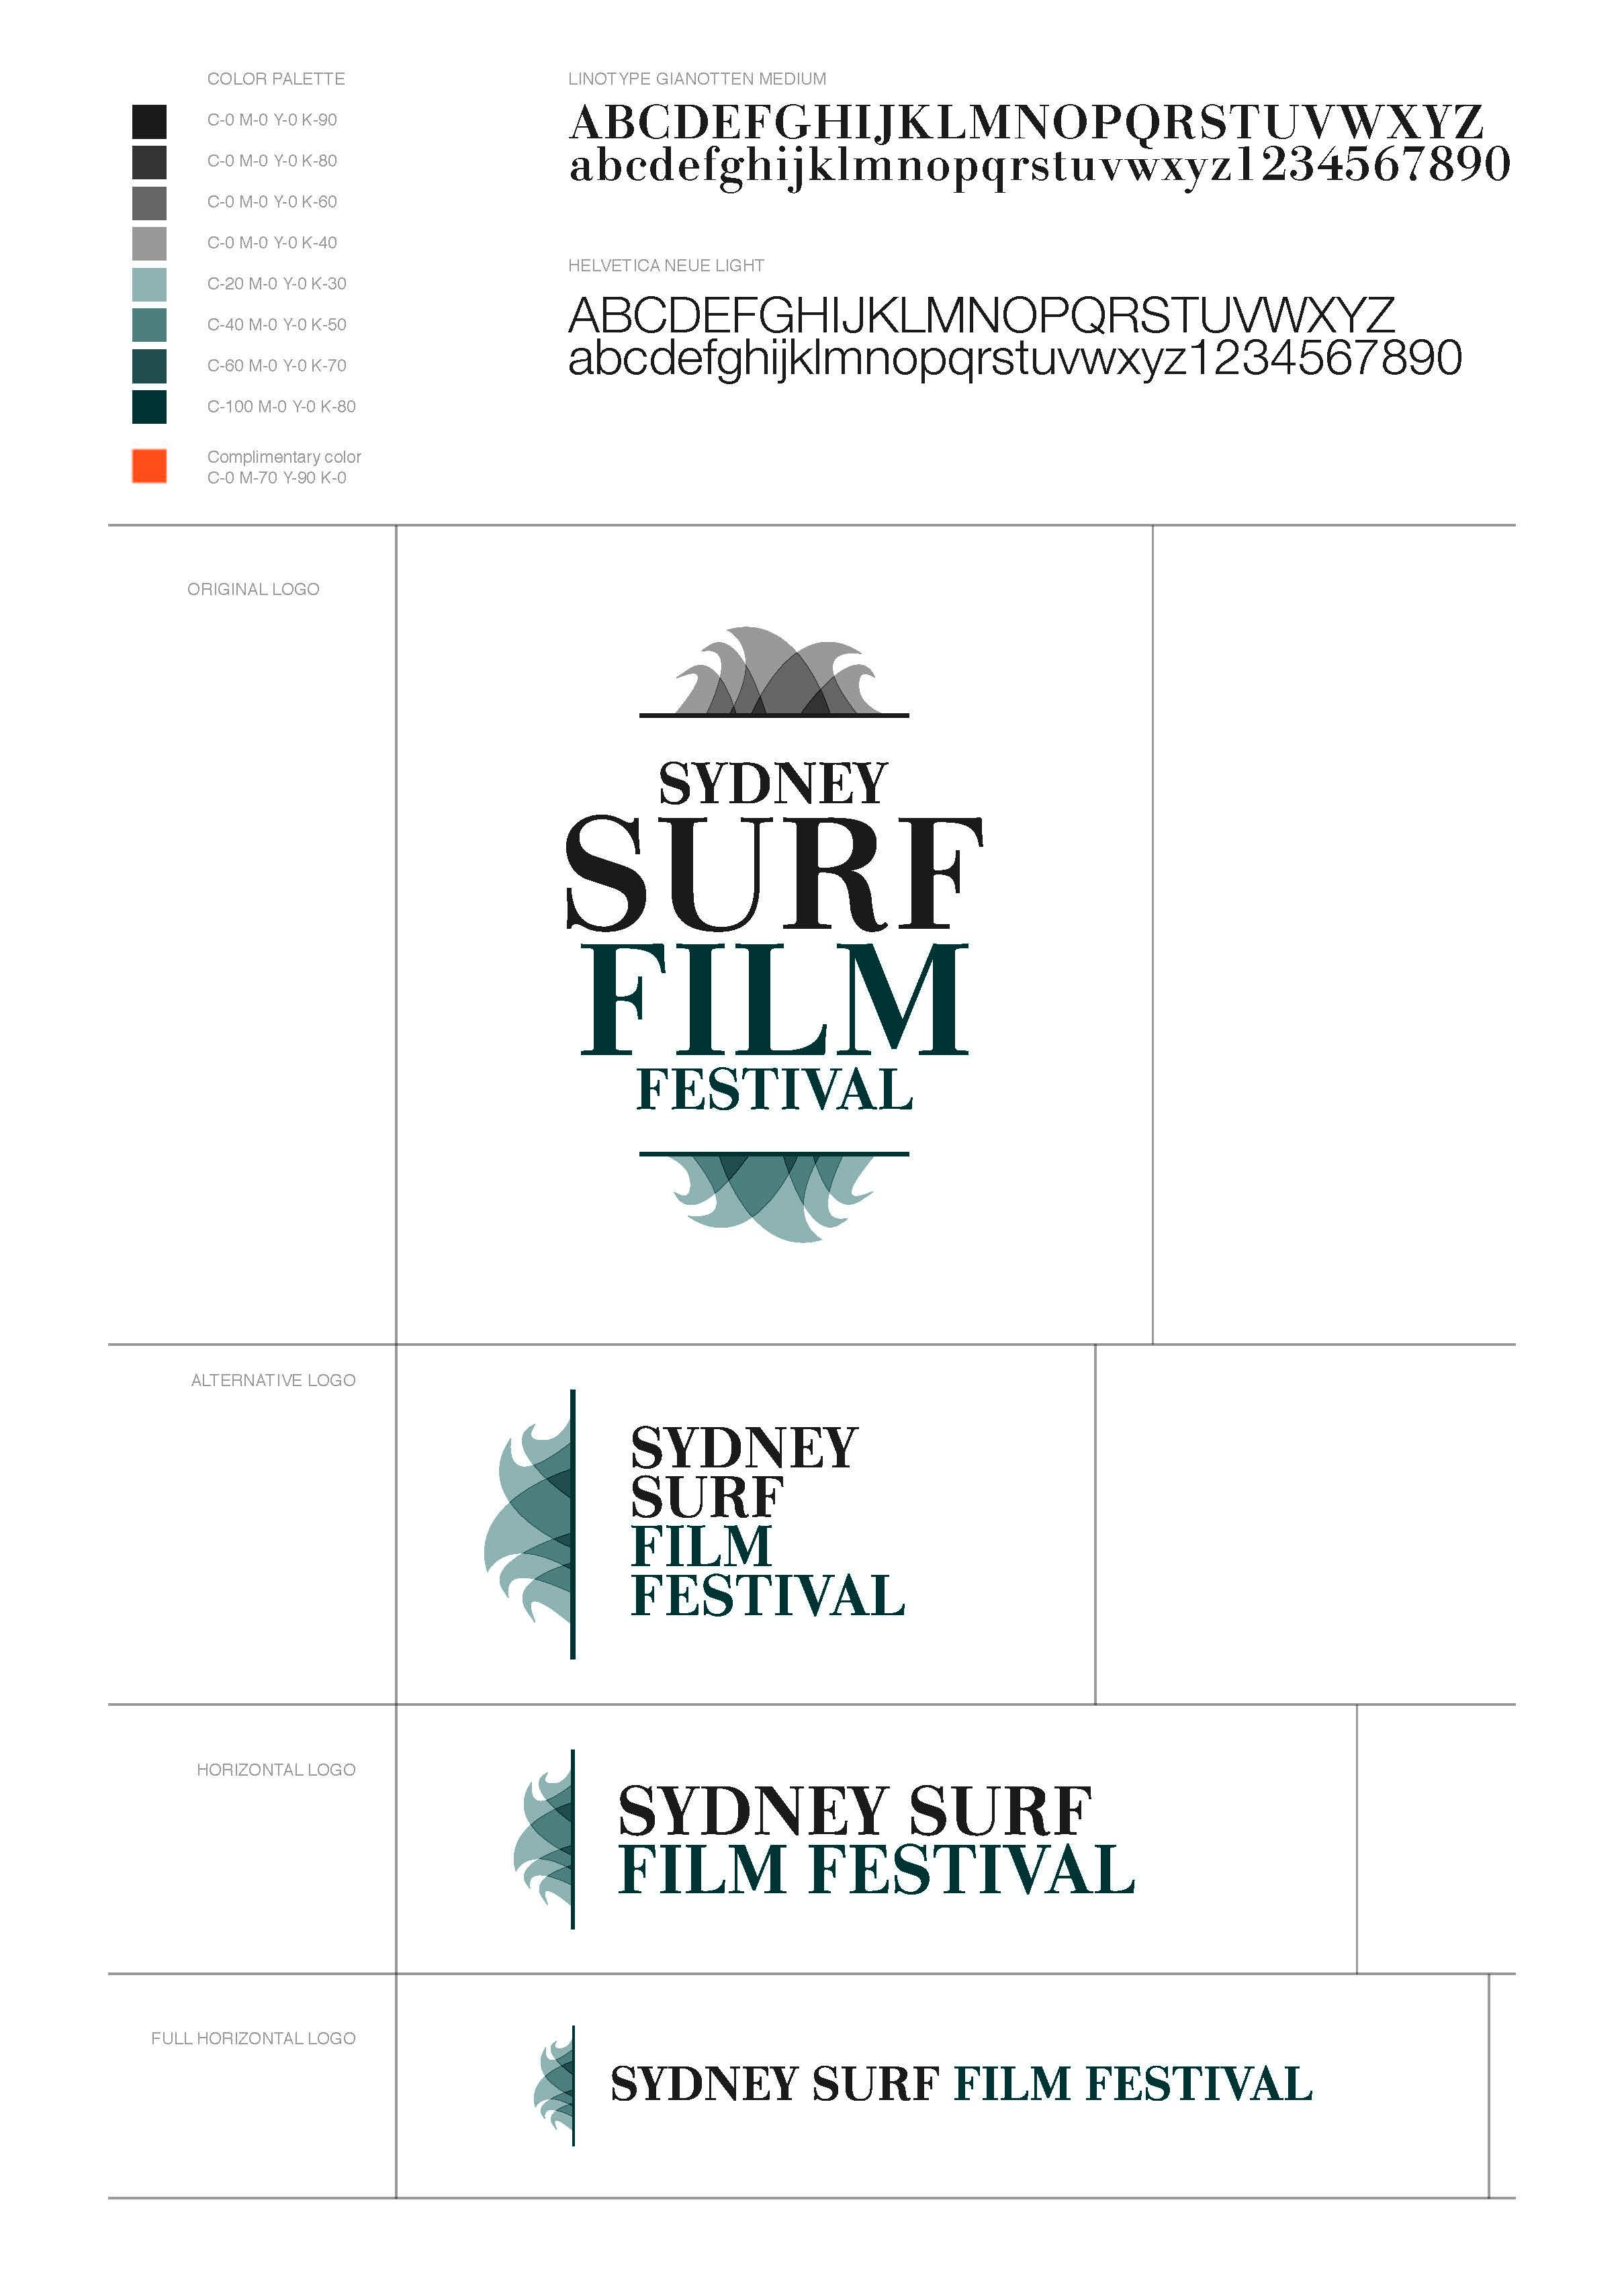 SSFF-logo-style-guide.jpg